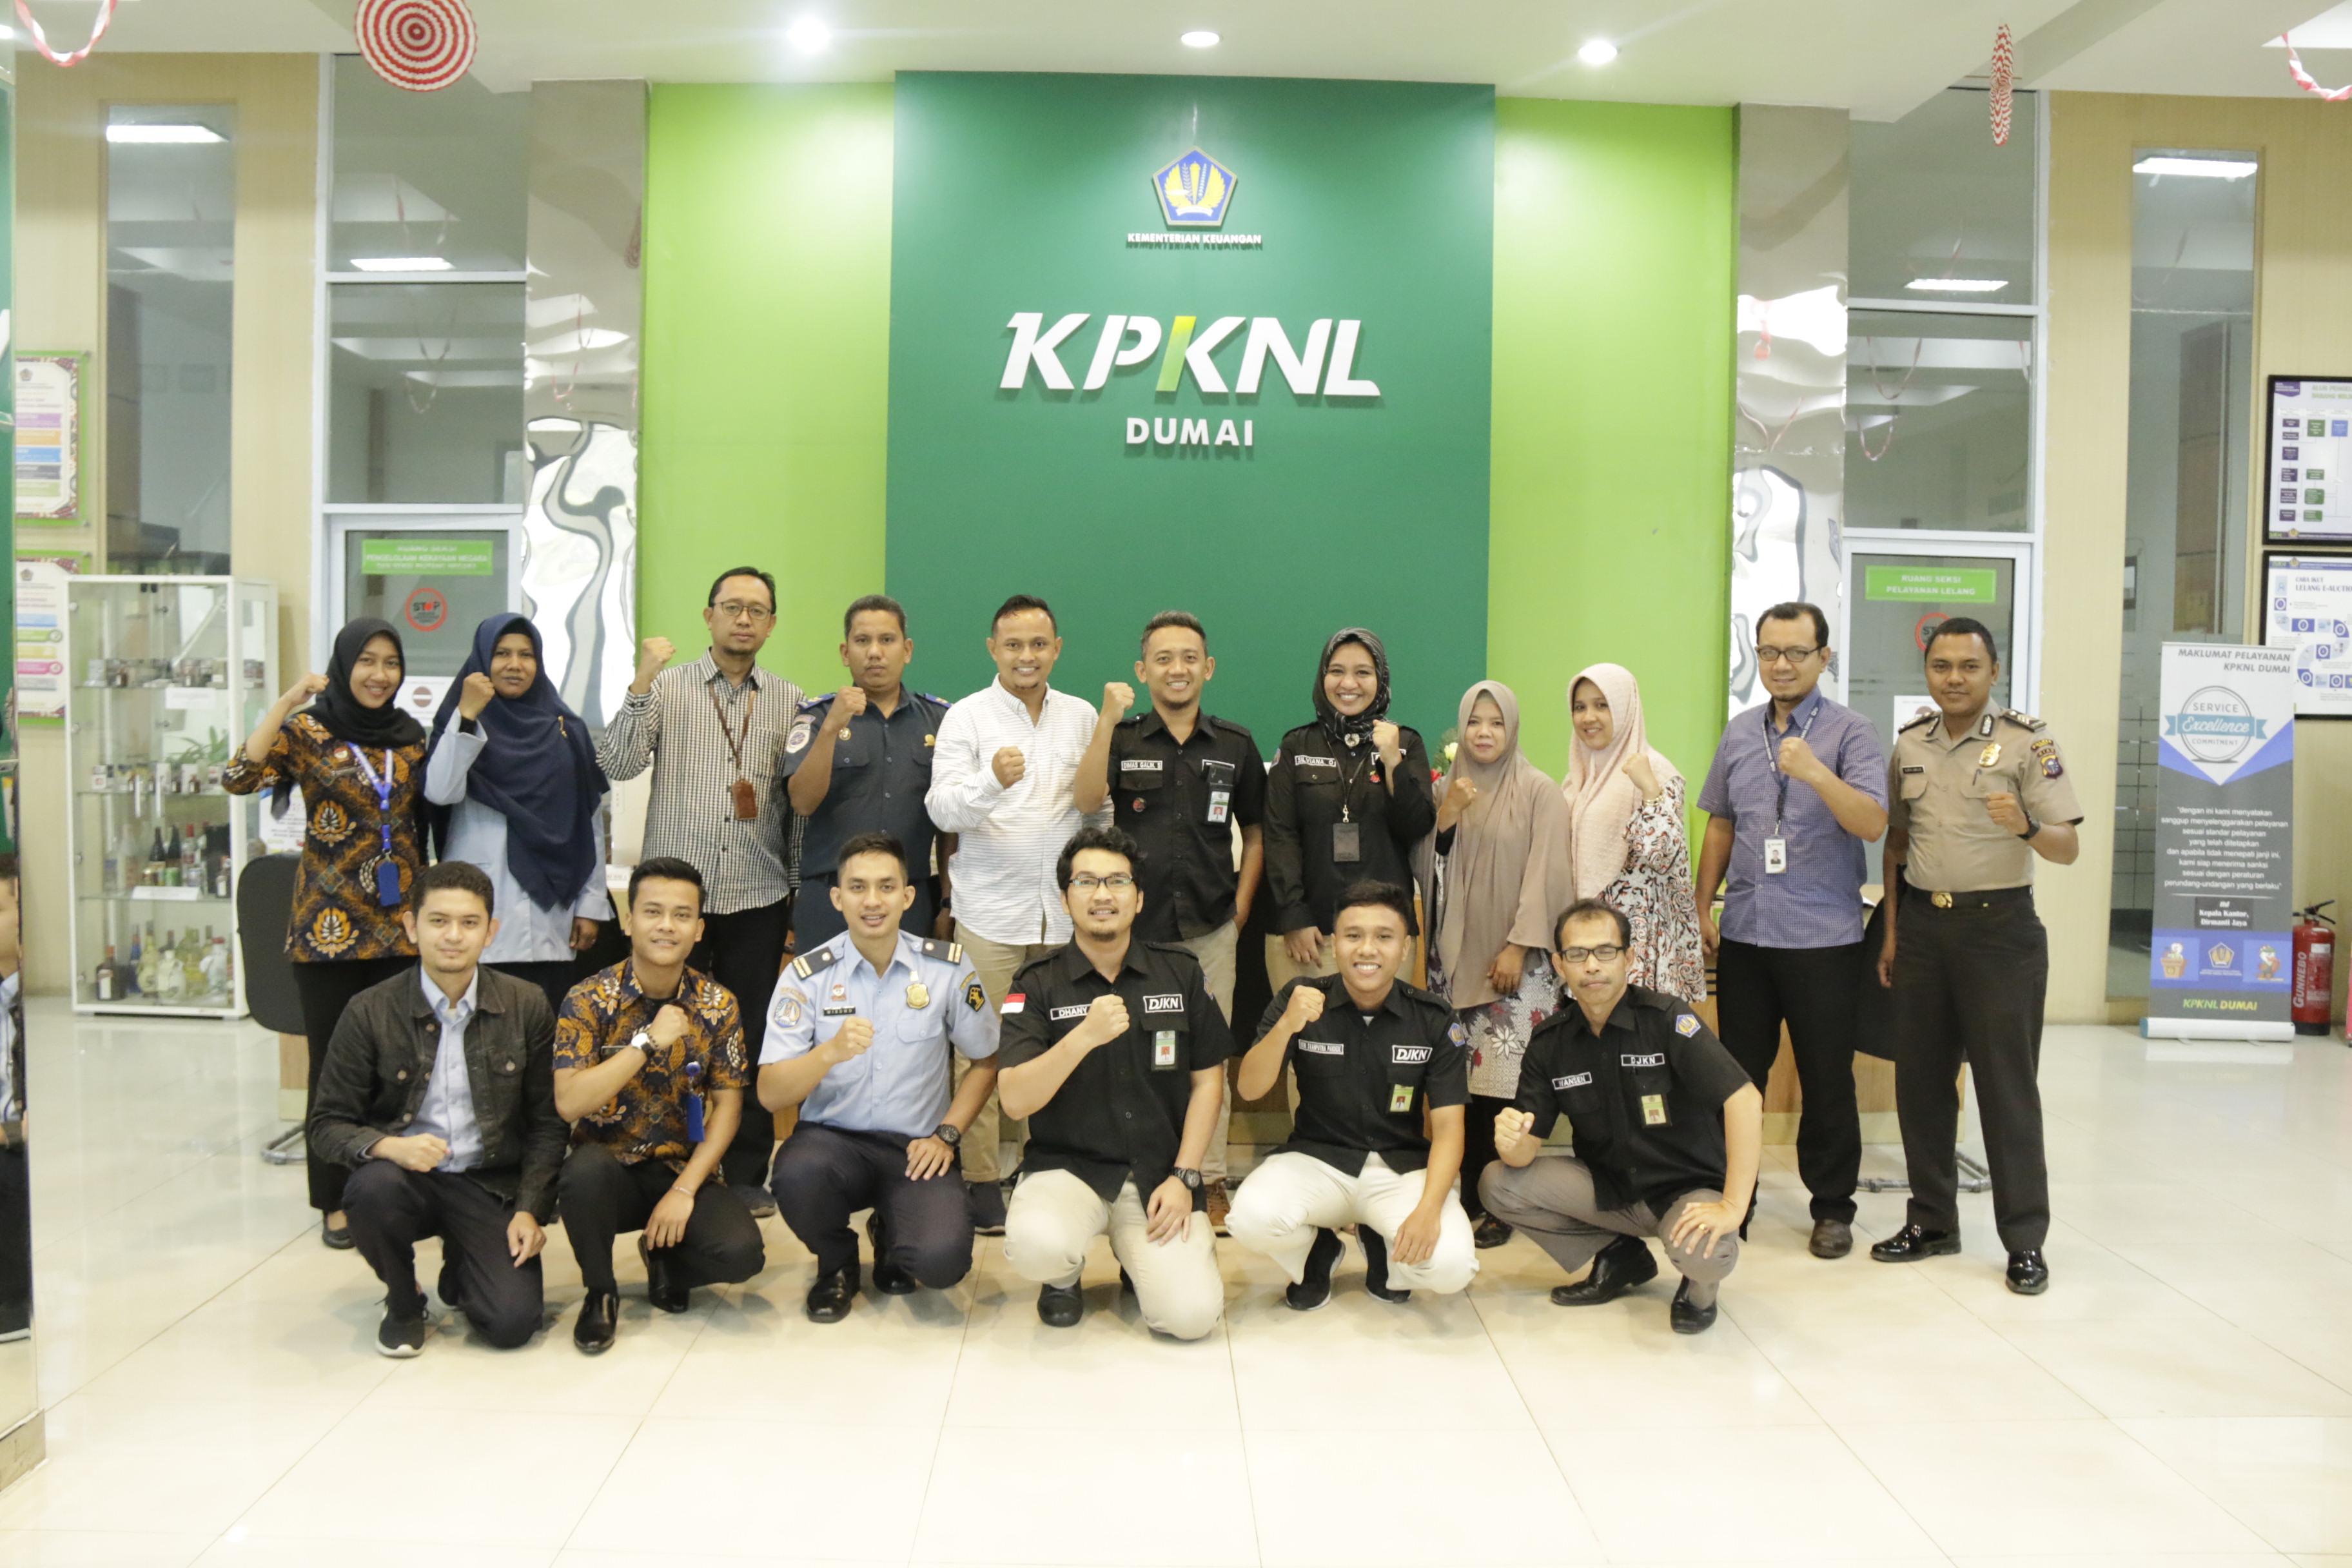 KPKNL Dumai Selenggarakan Sosialisasi Pengelolaan BMN dan Lelang Online